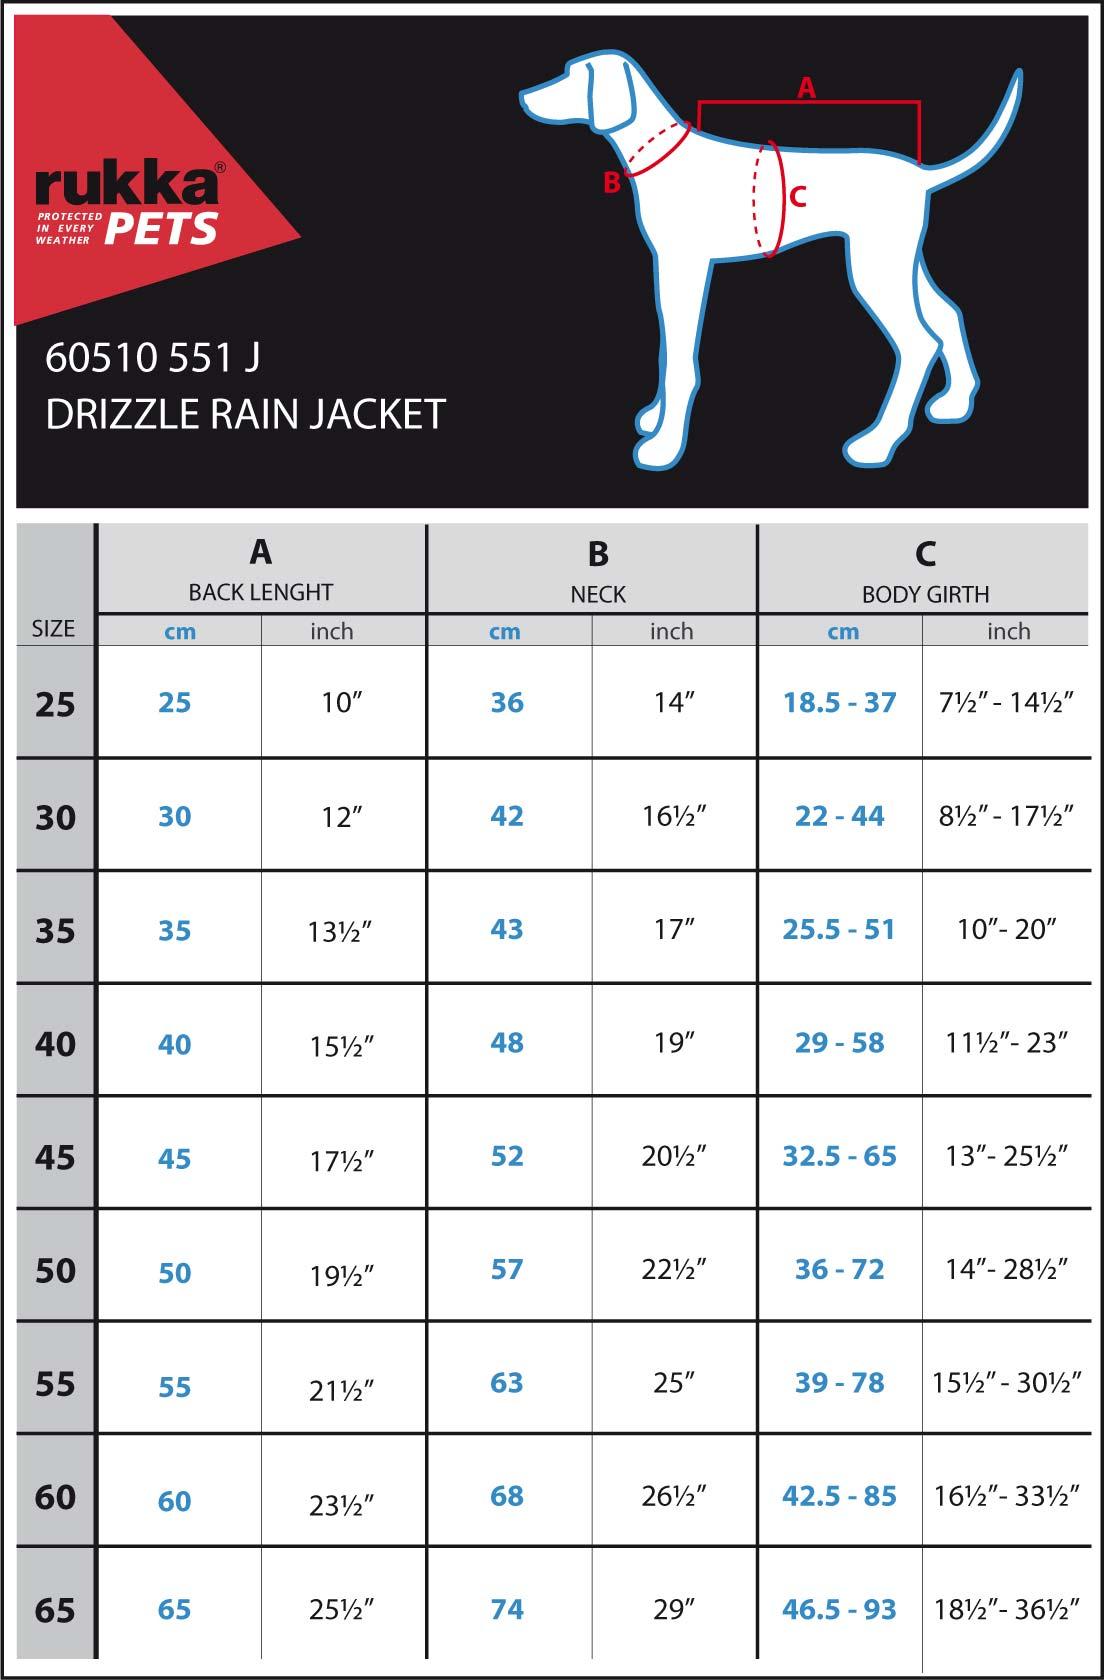 DRIZZLE-RAIN-JACKET-SIZE-CHART